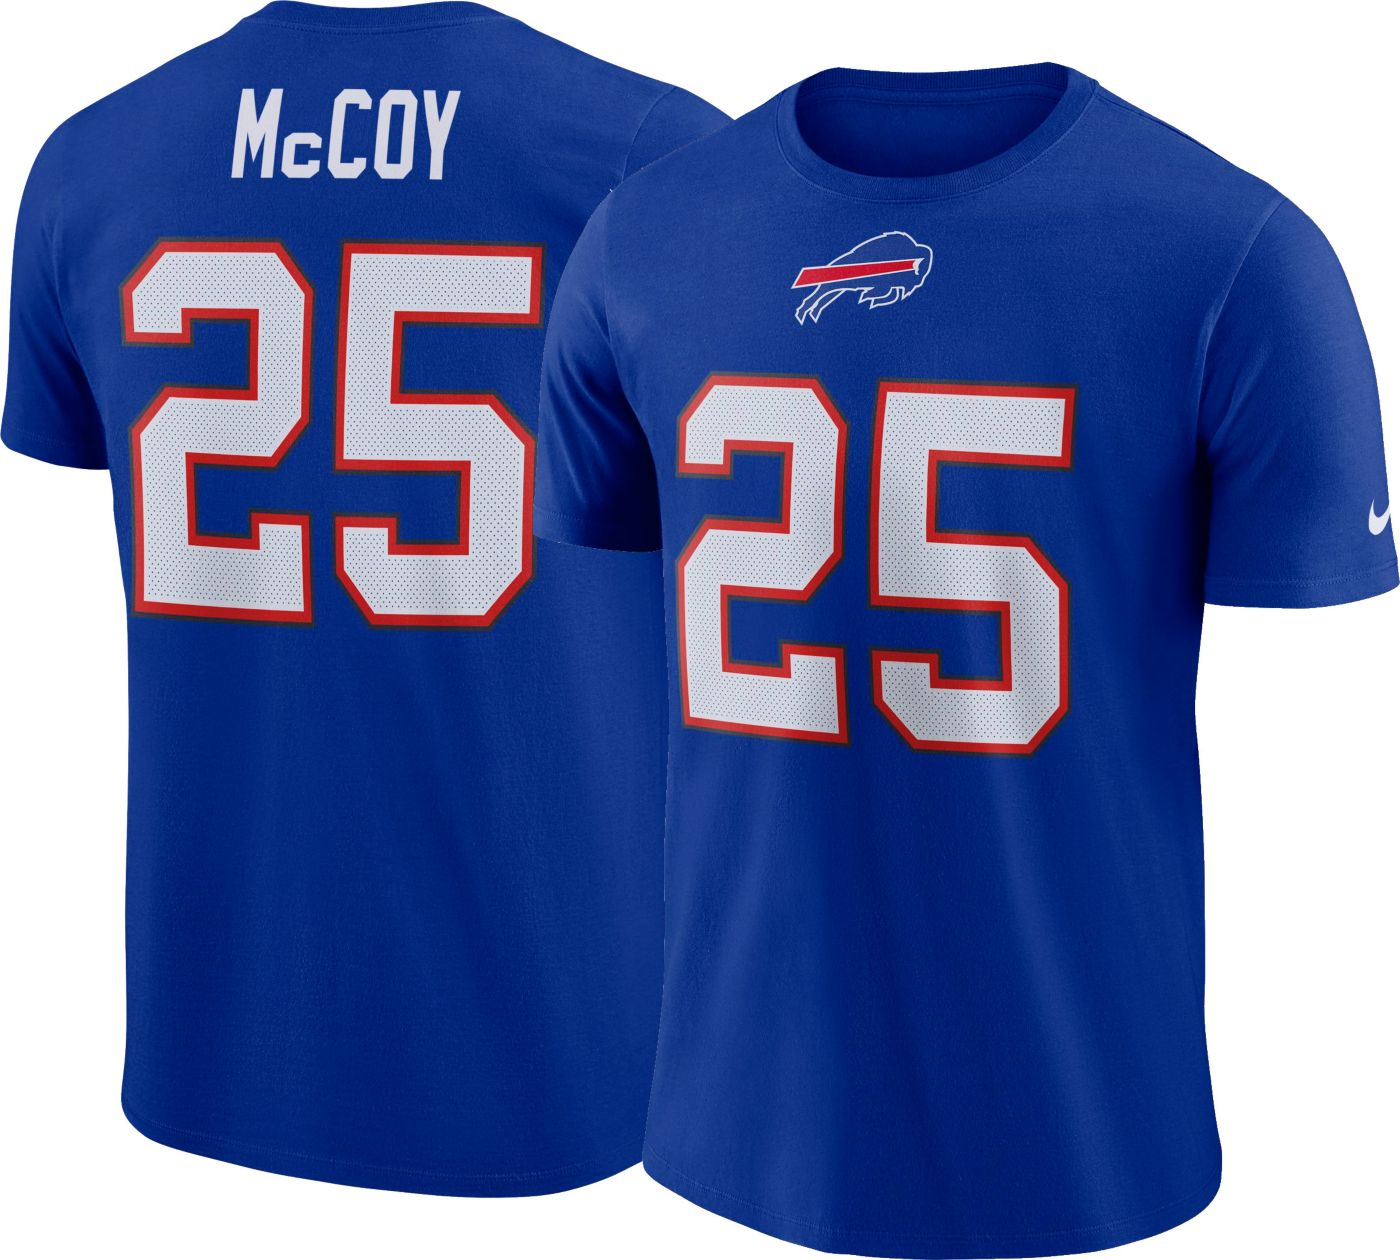 LeSean McCoy #25 Nike Men's Buffalo Bills Pride Royal T-Shirt